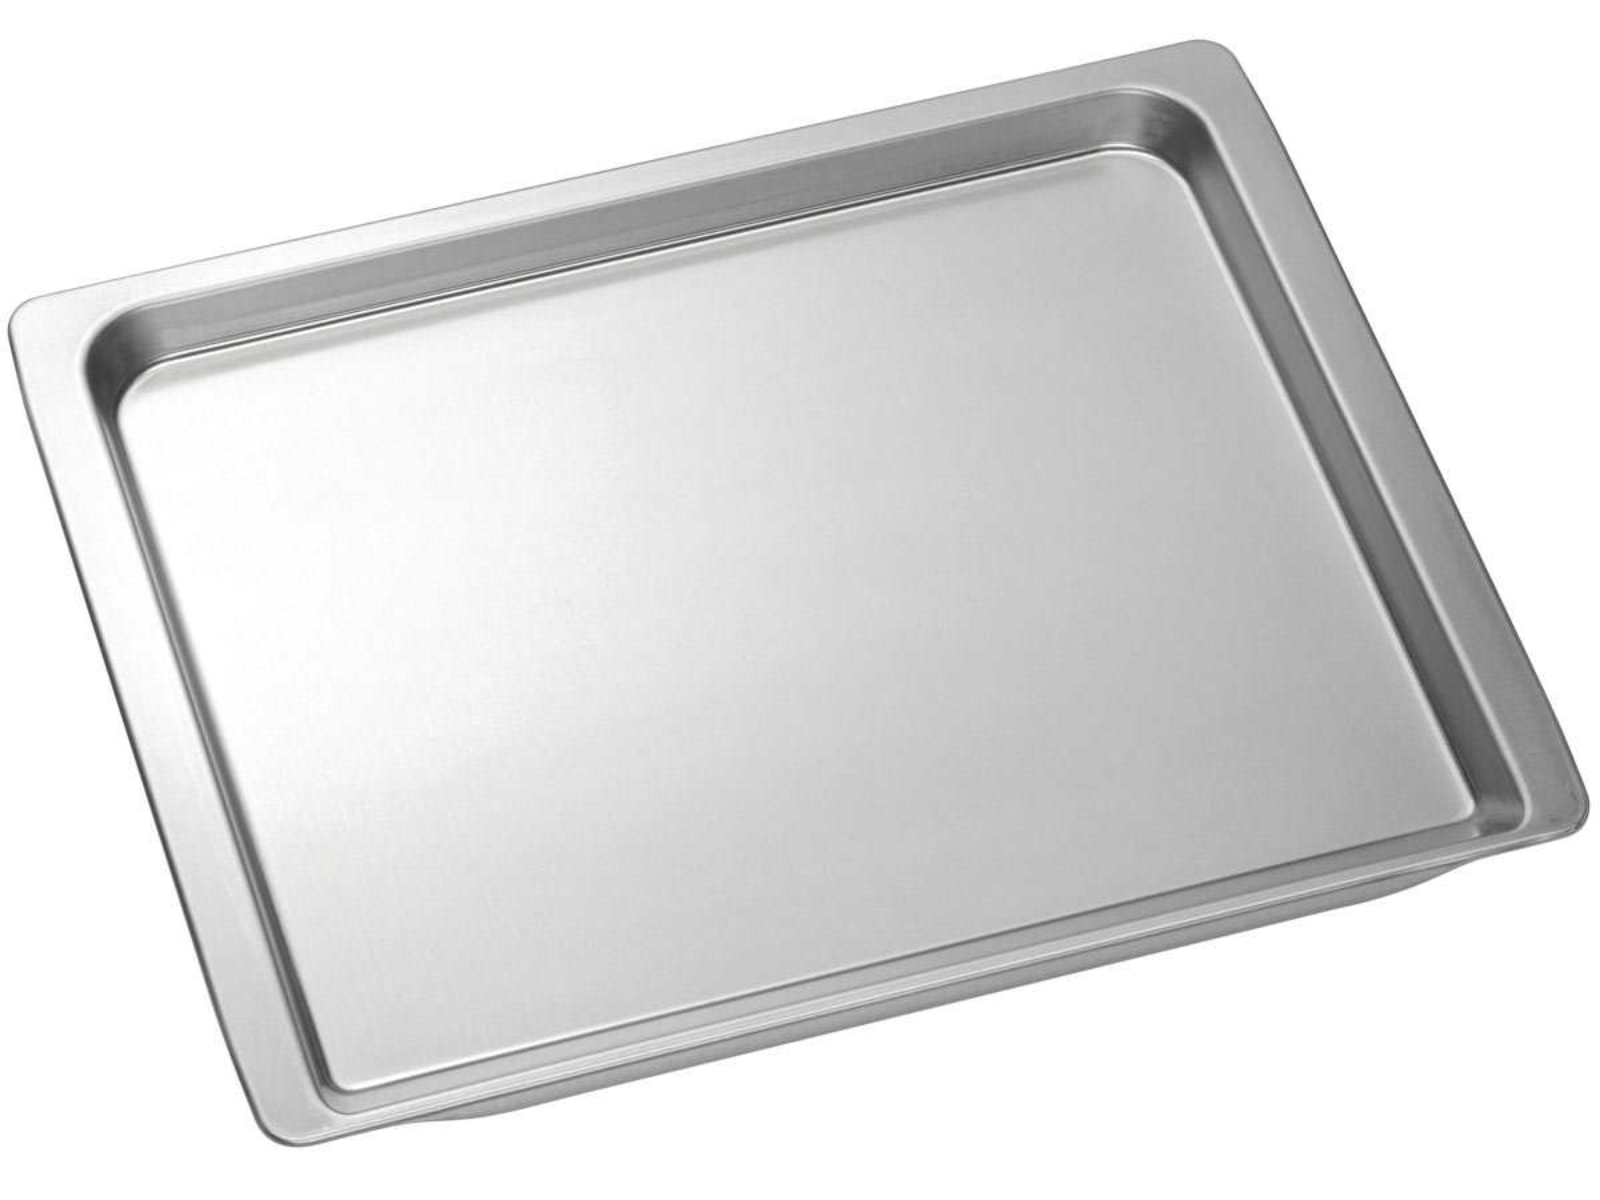 neff z1332x0 backblech aluminium flach zubeh r backofen herd ebay. Black Bedroom Furniture Sets. Home Design Ideas